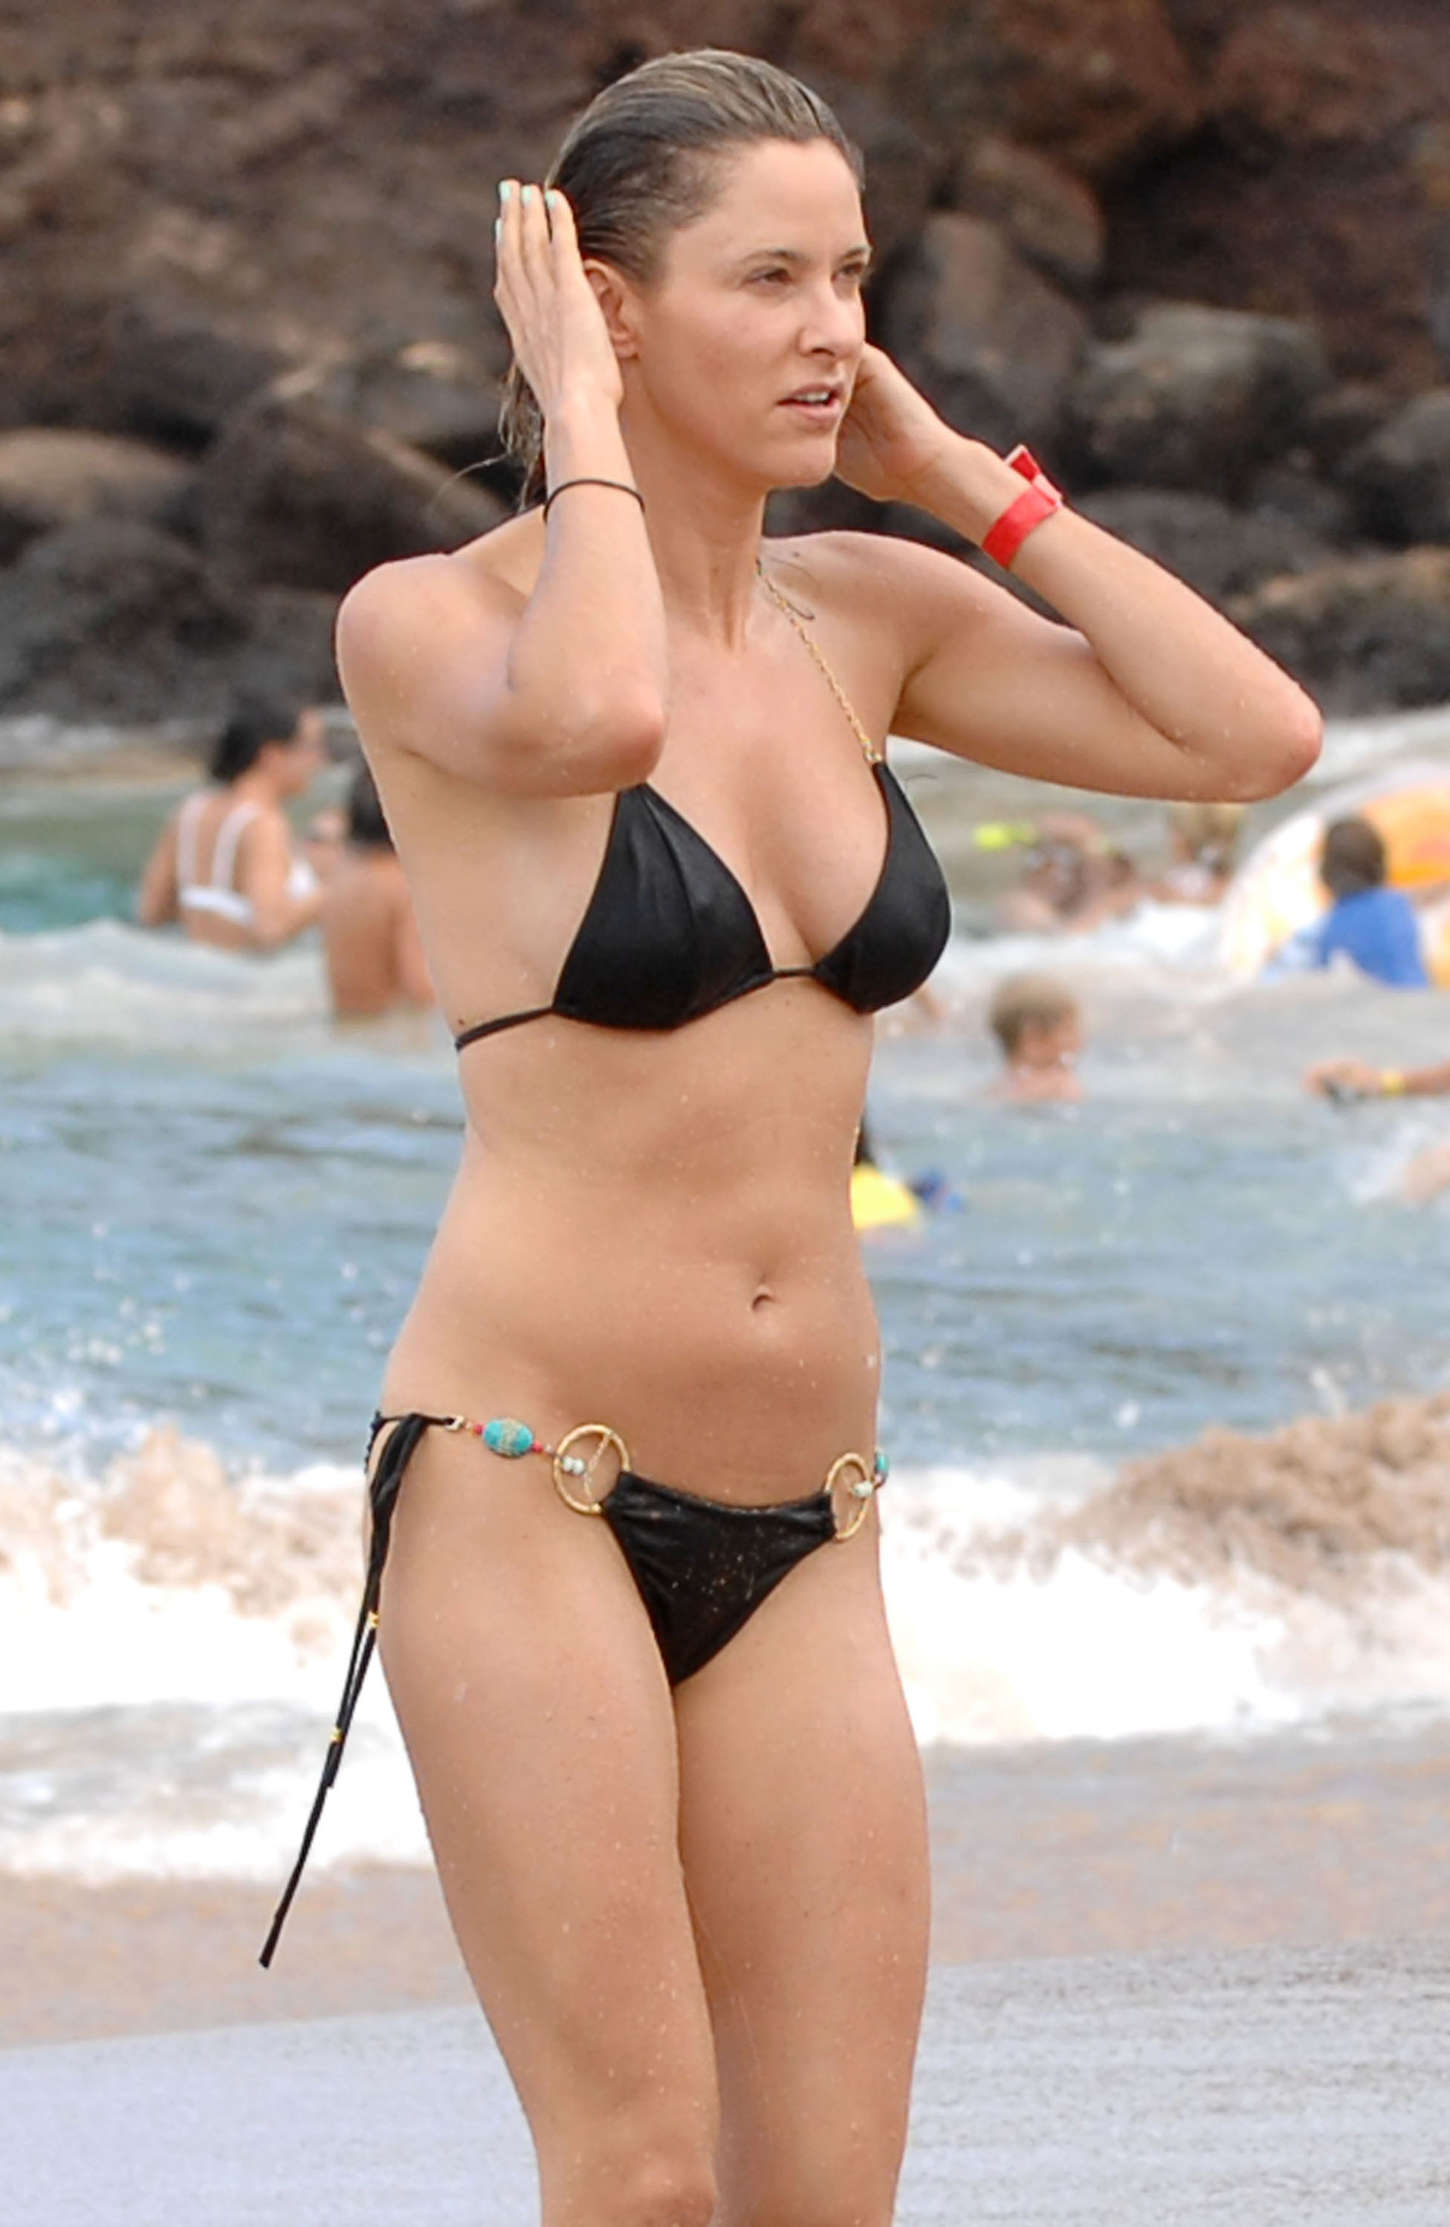 sexy jill wagner at beach